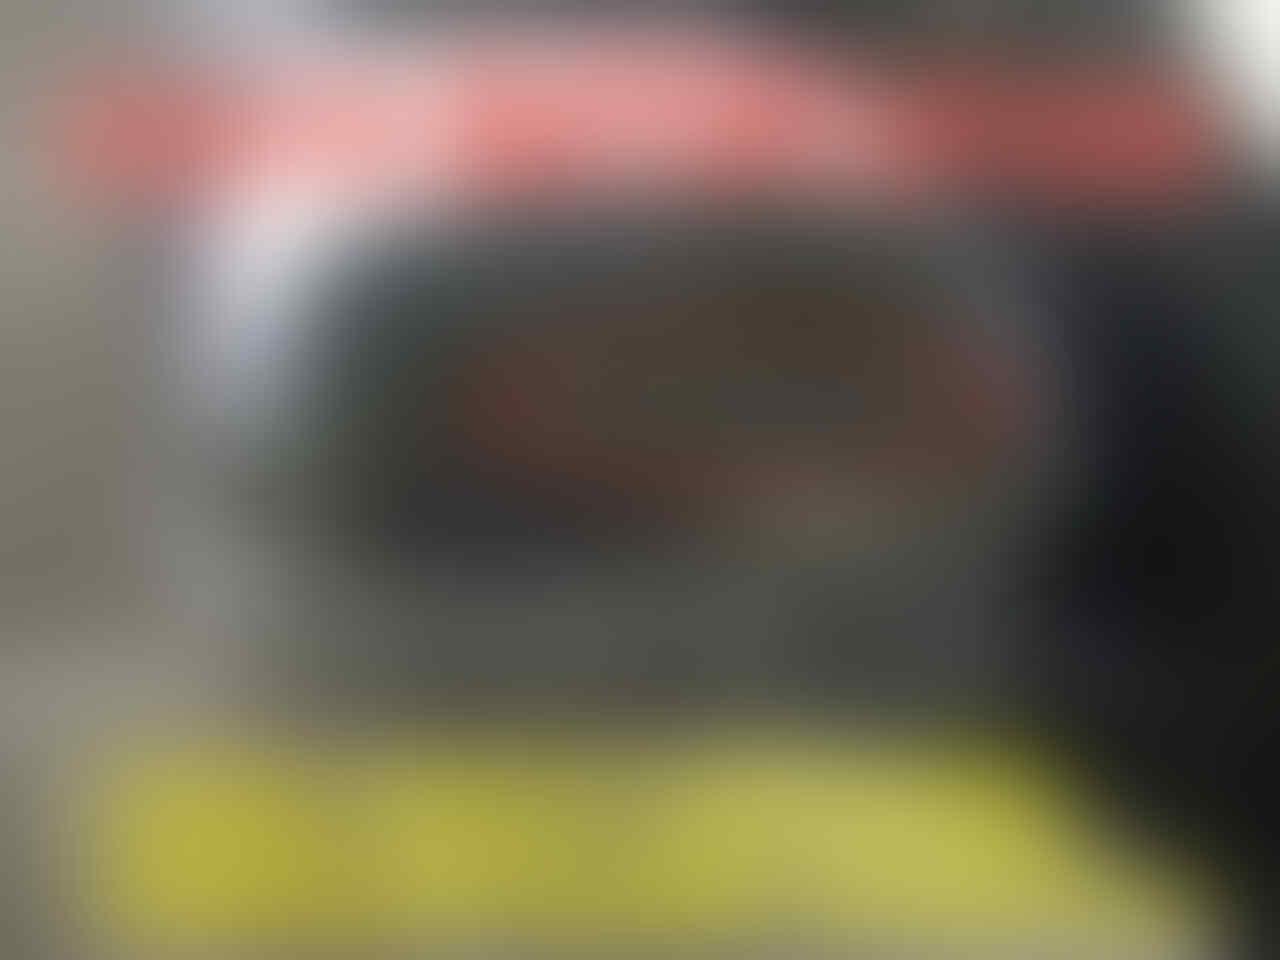 (SHARE) Waspada pencurian Spion Mobil